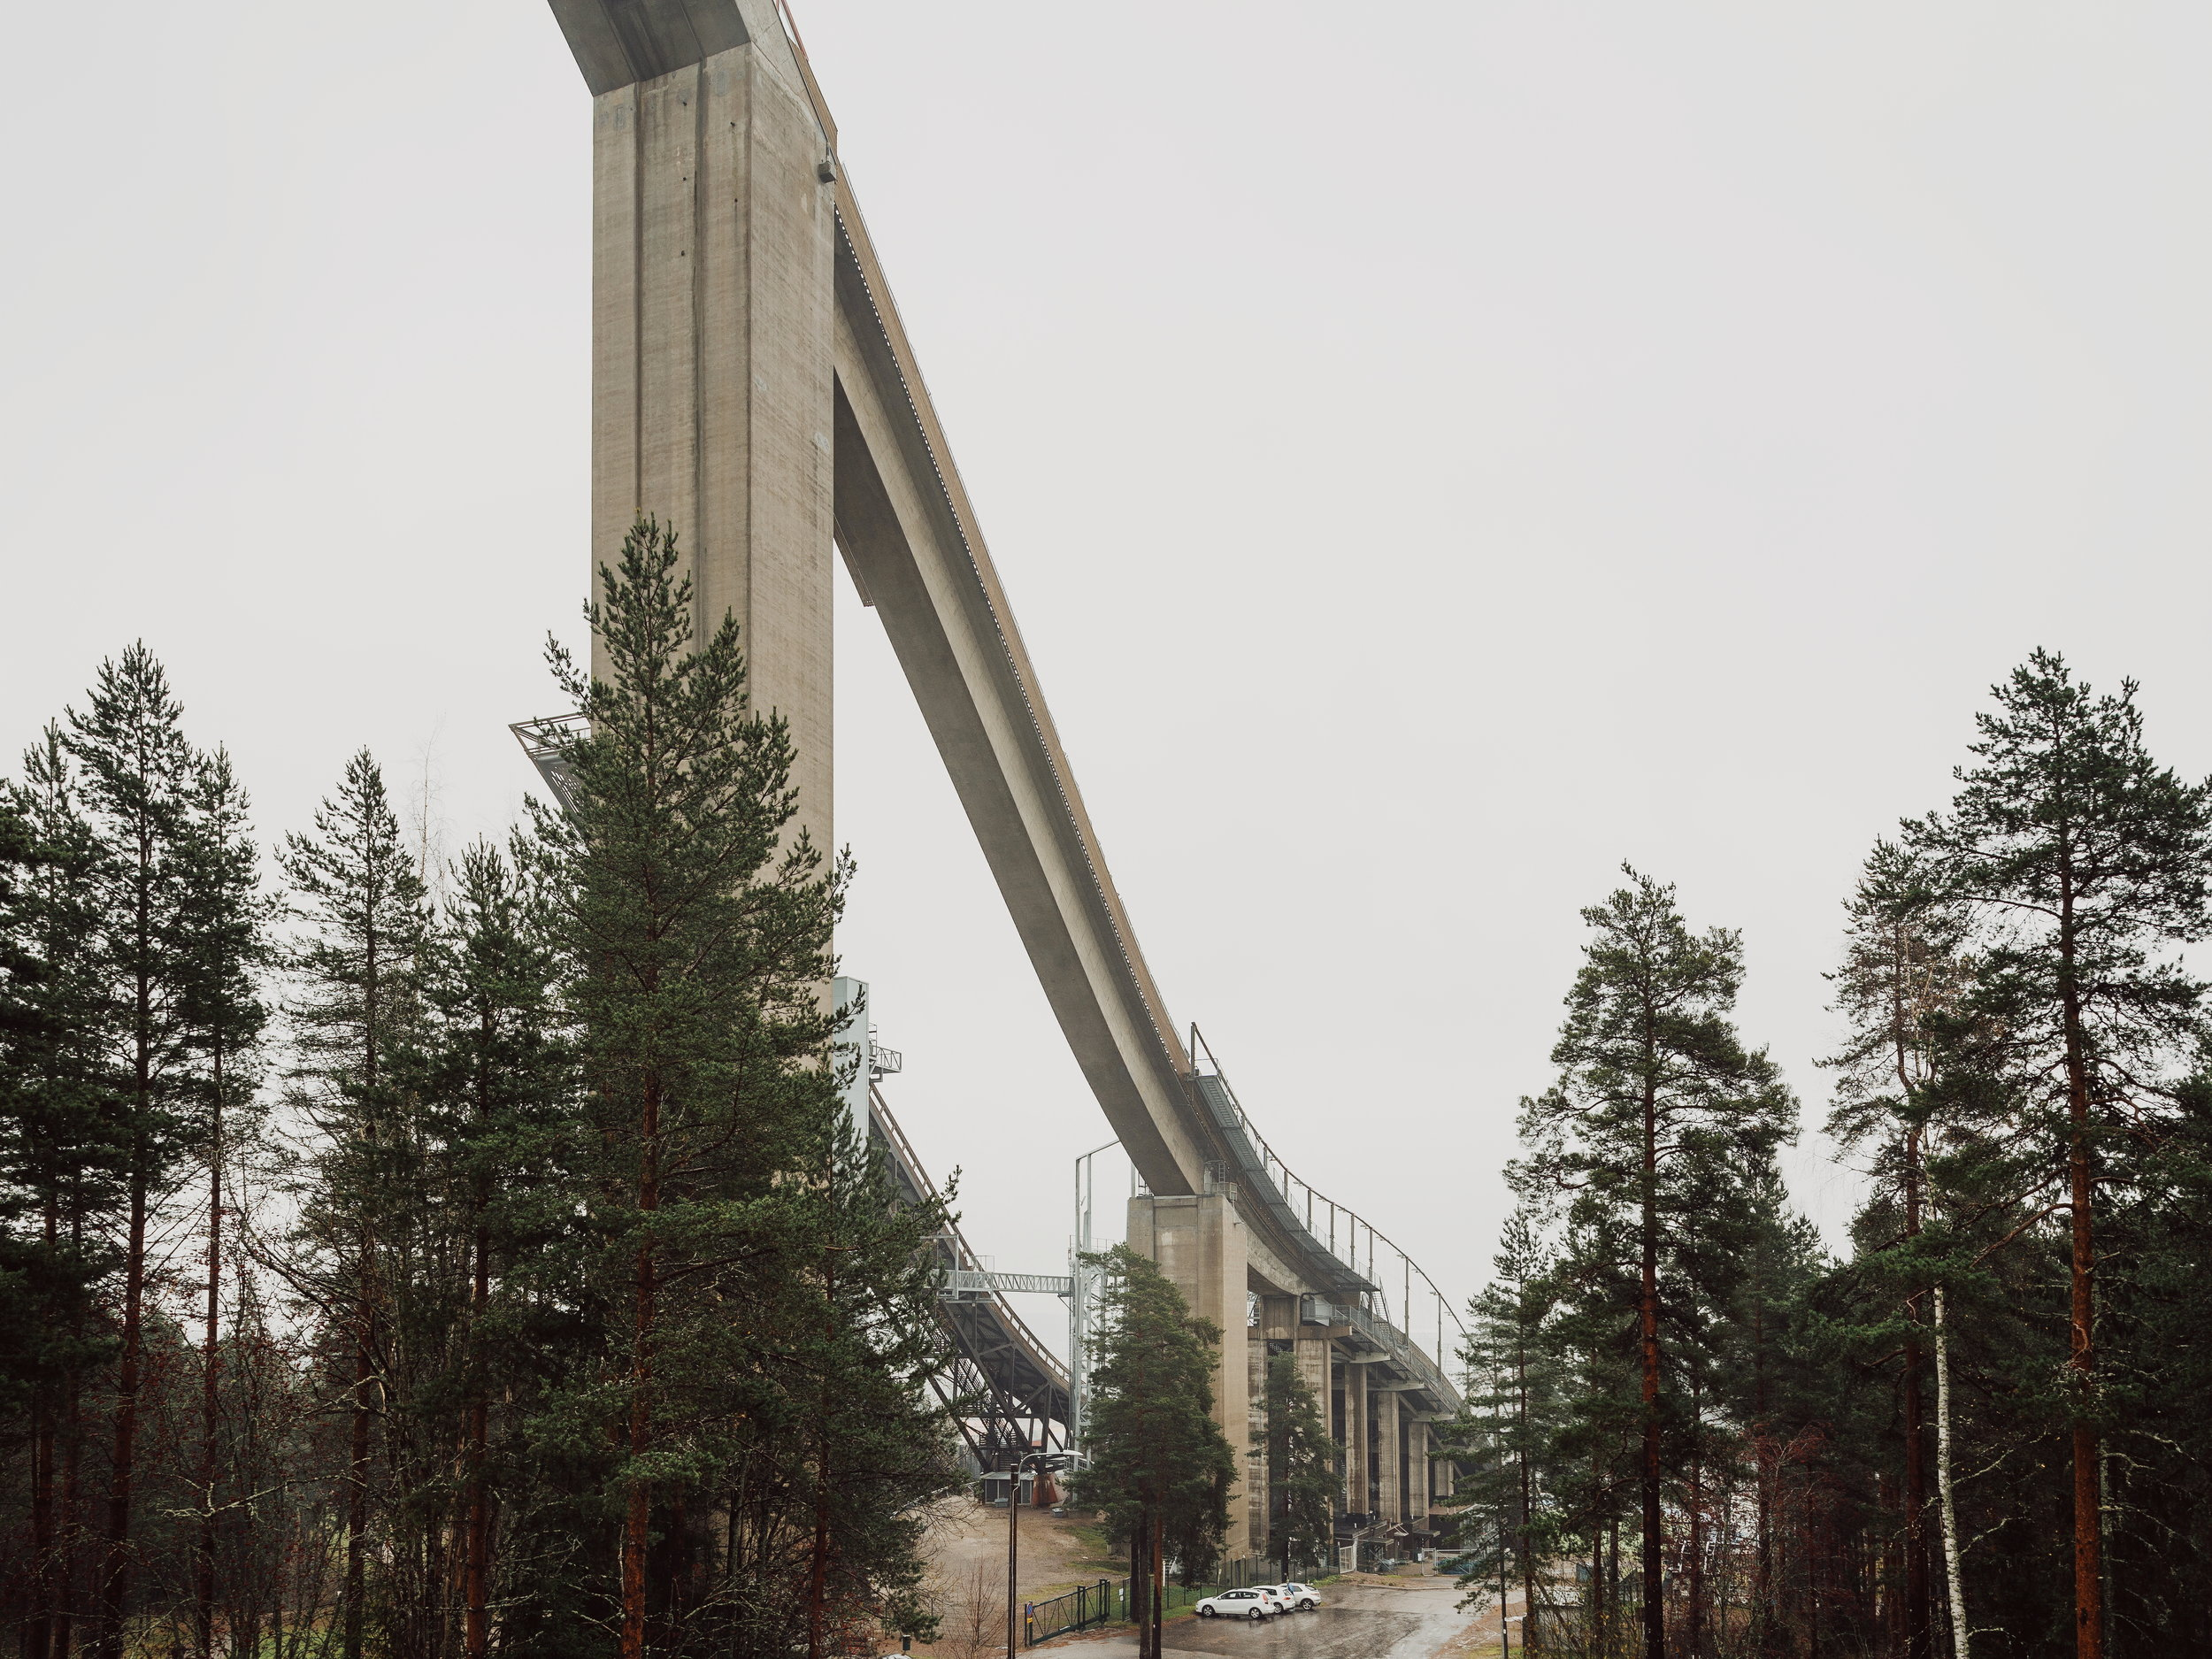 Lahti, Finland, November 2017